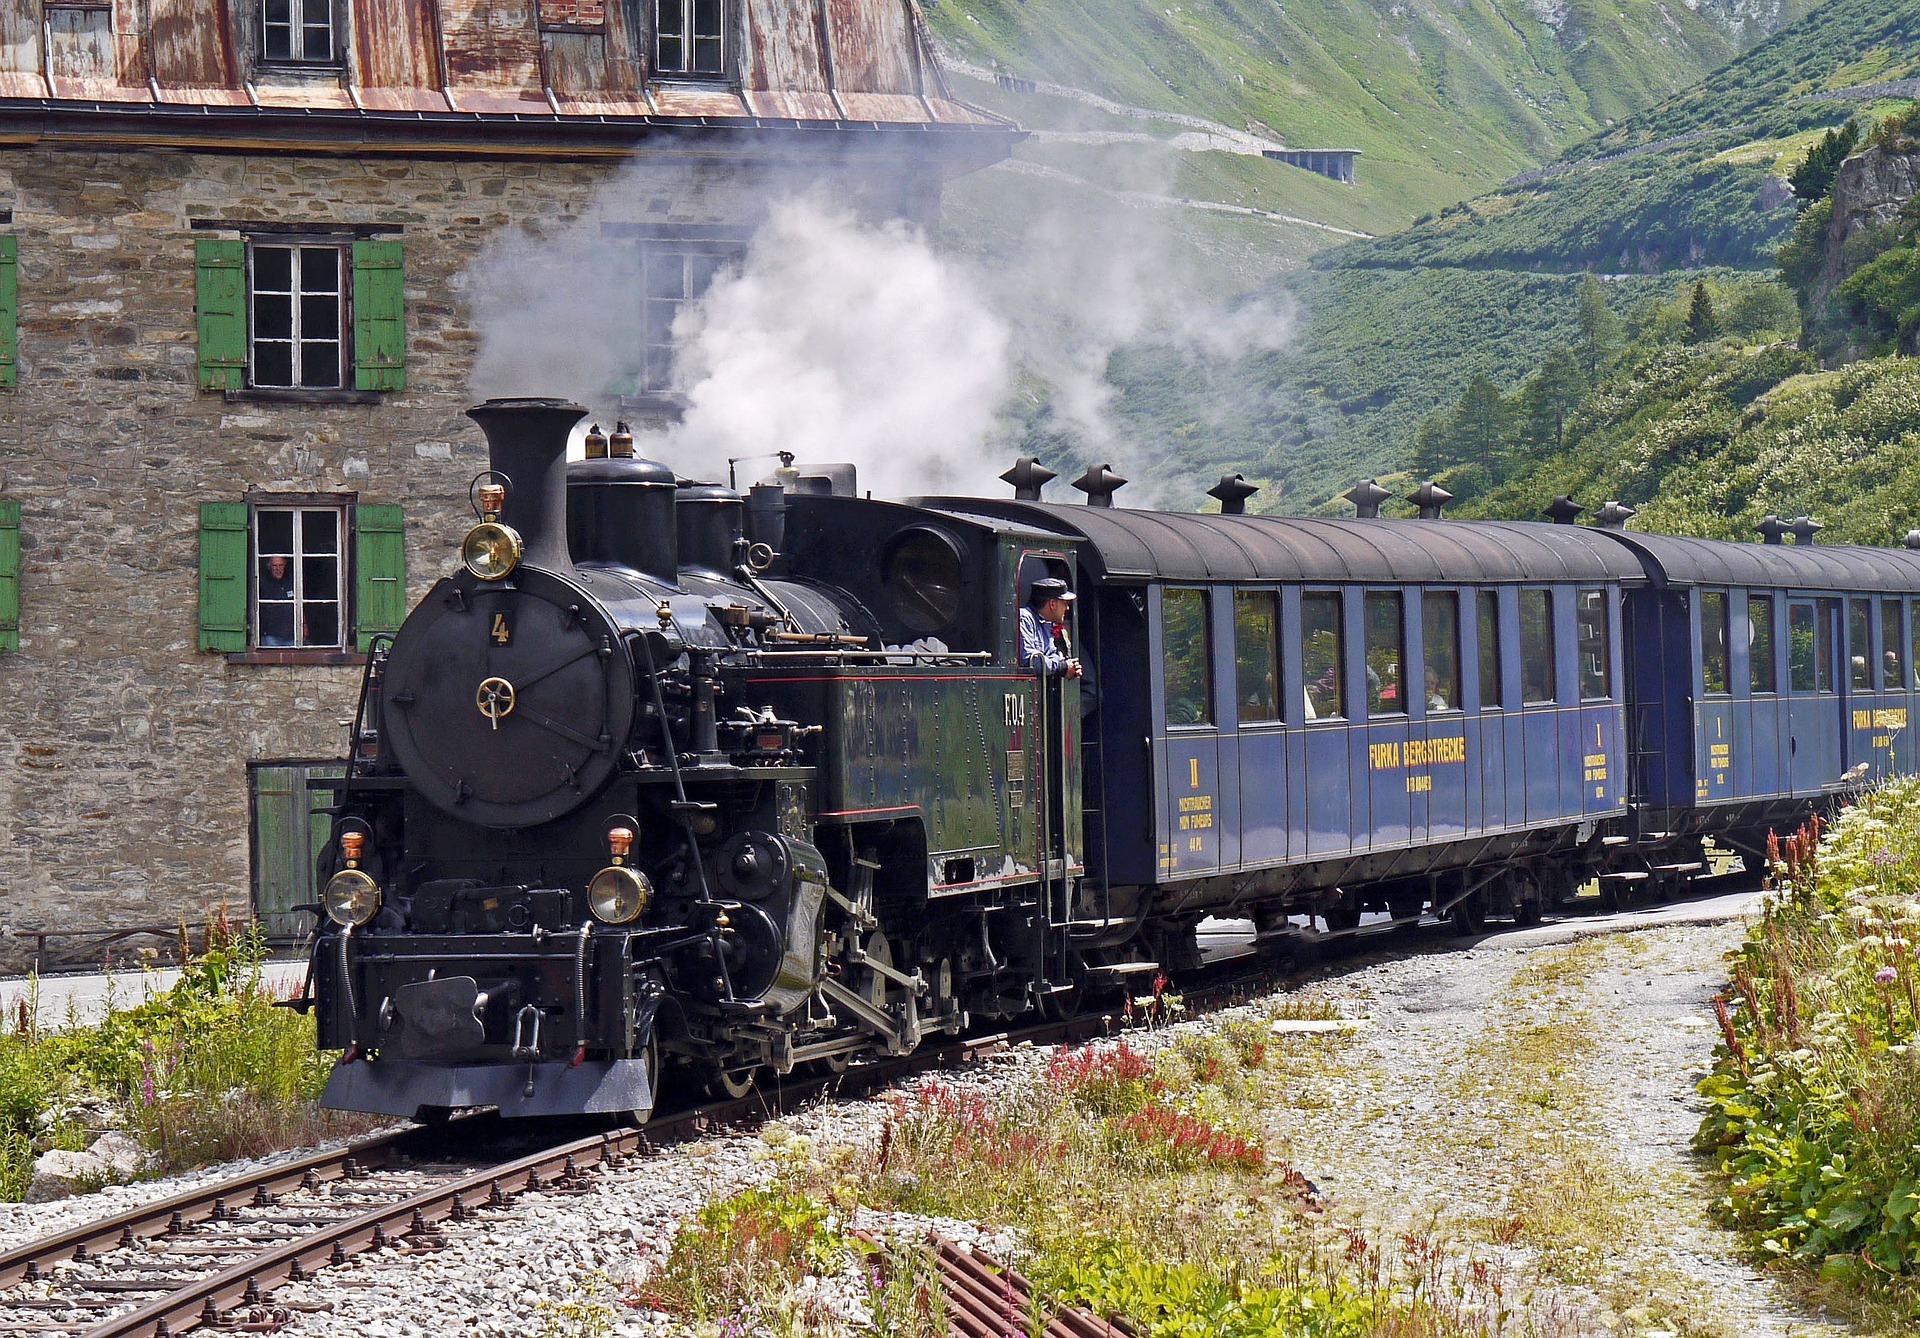 tren de vapor, tren, locomotora, vagones, furka bahn, alpes, suiza - Fondos de Pantalla HD - professor-falken.com